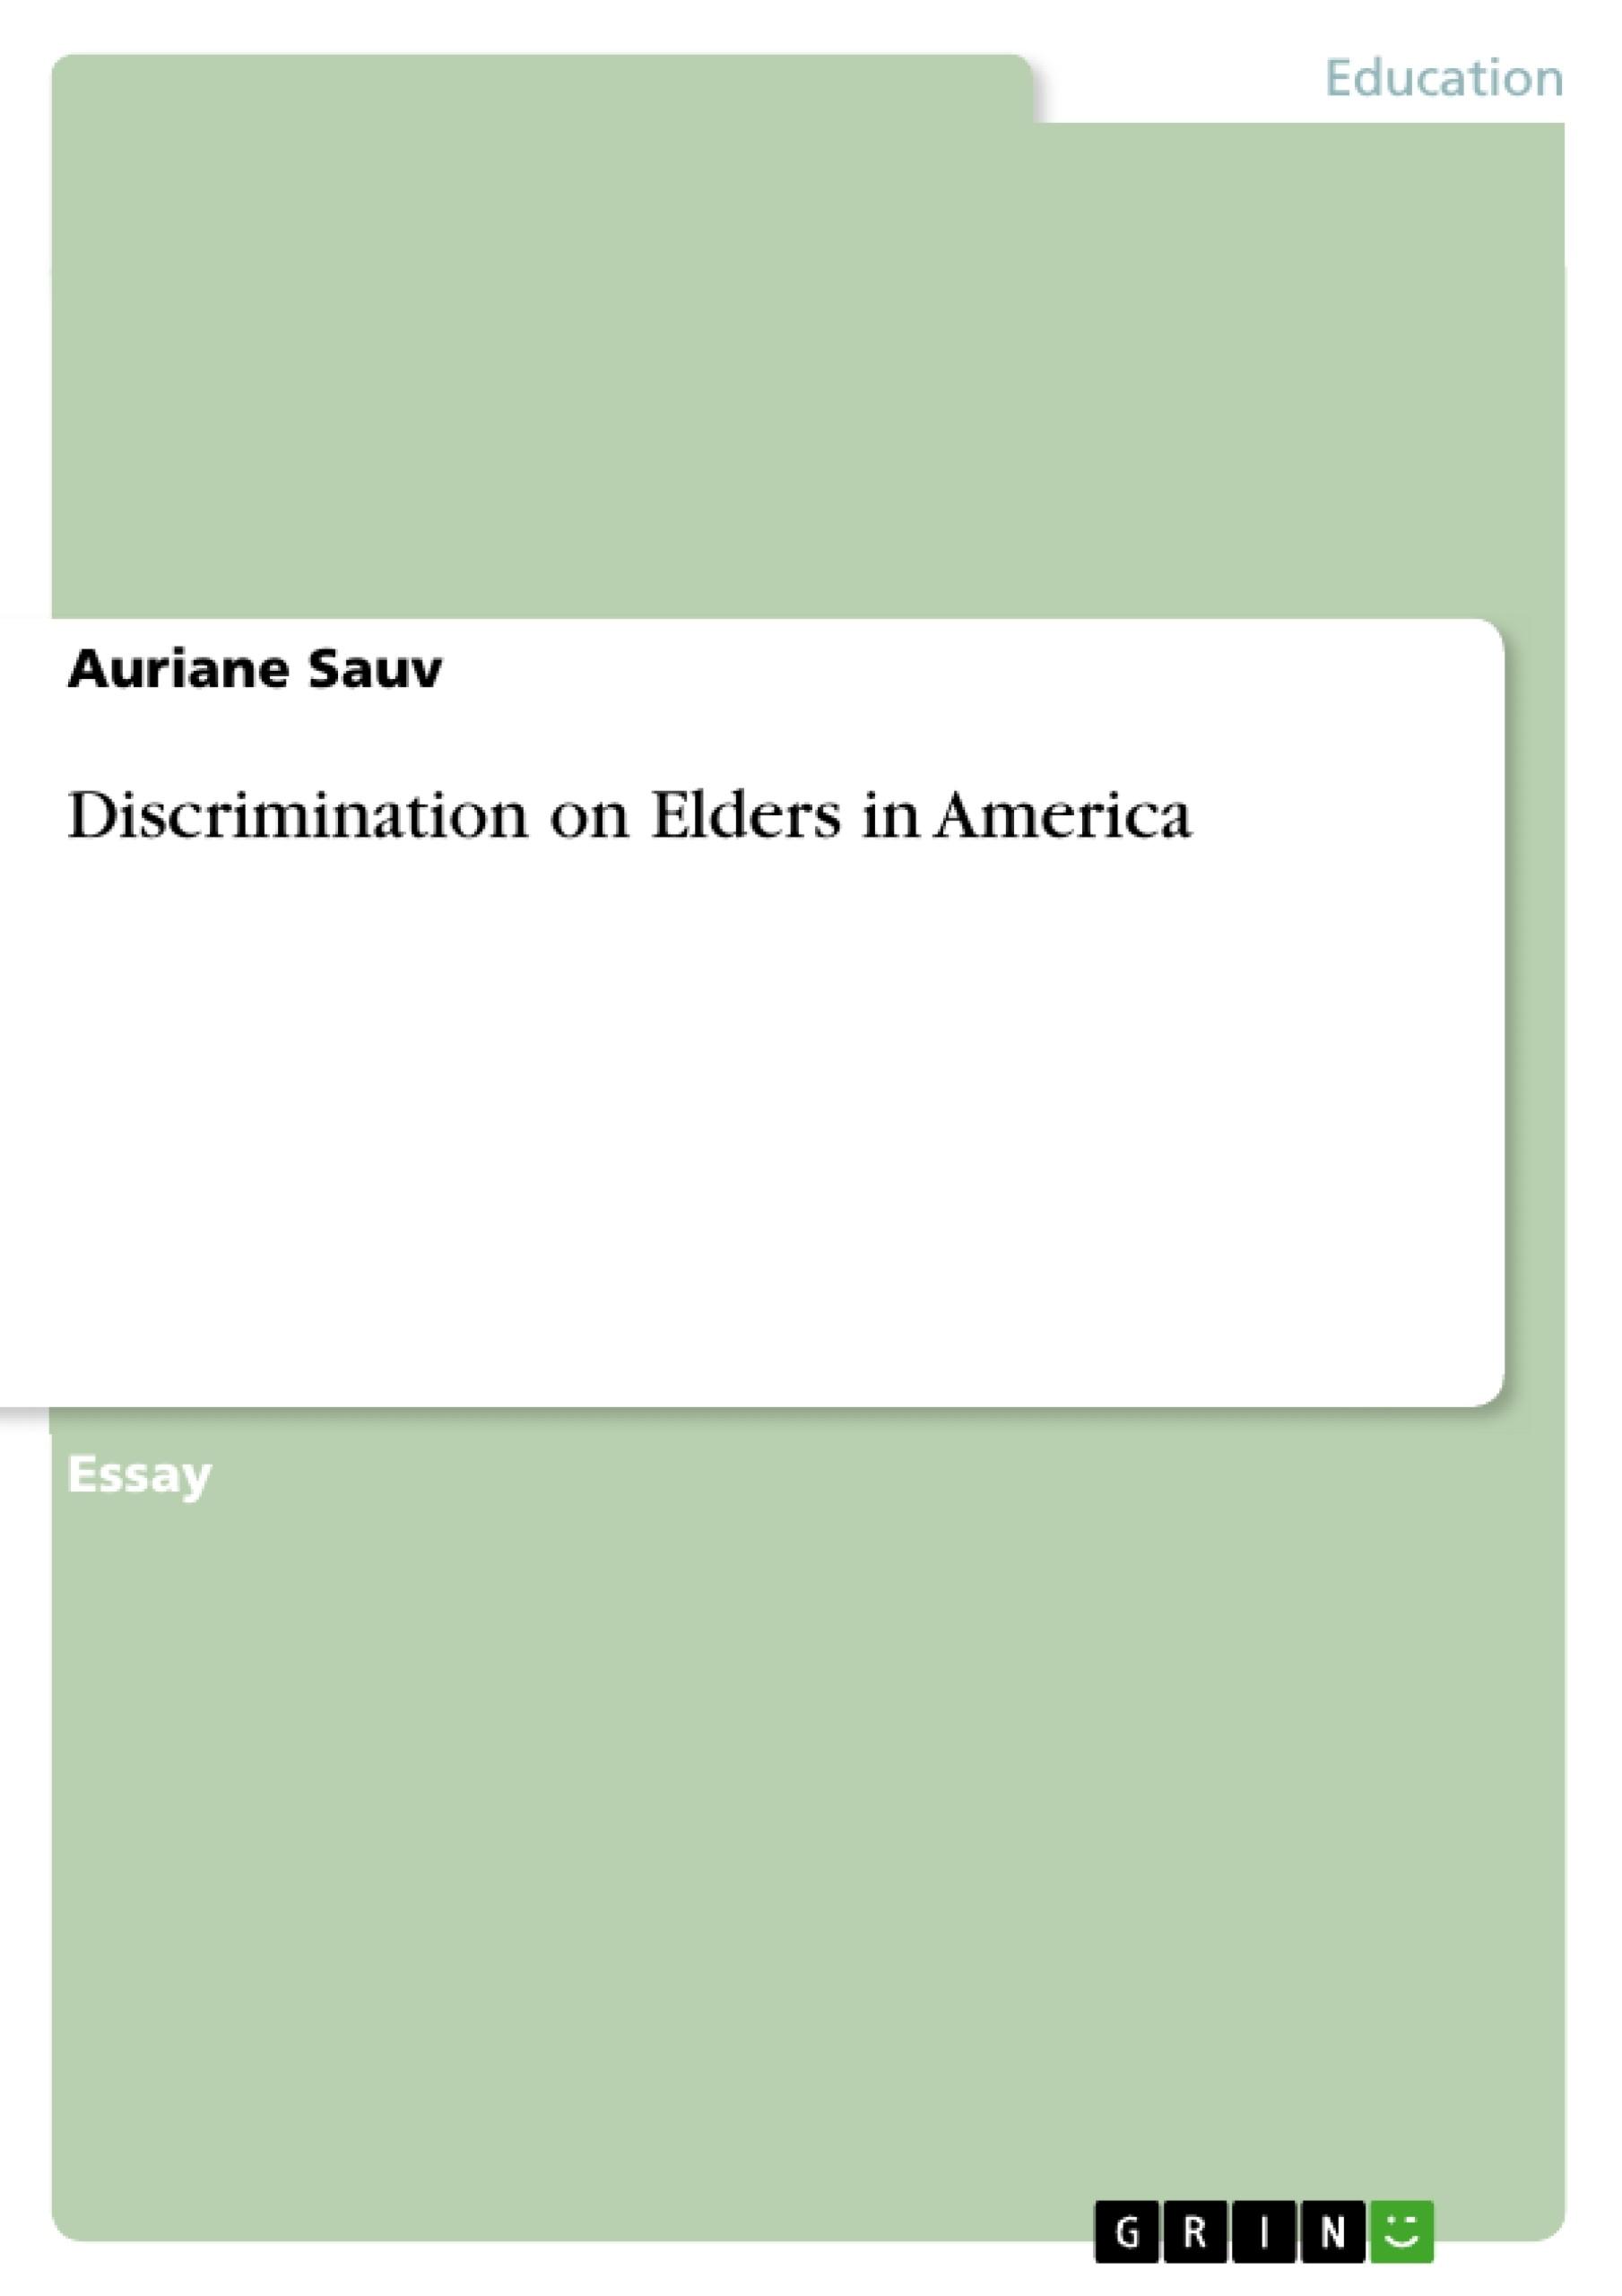 Title: Discrimination on Elders in America